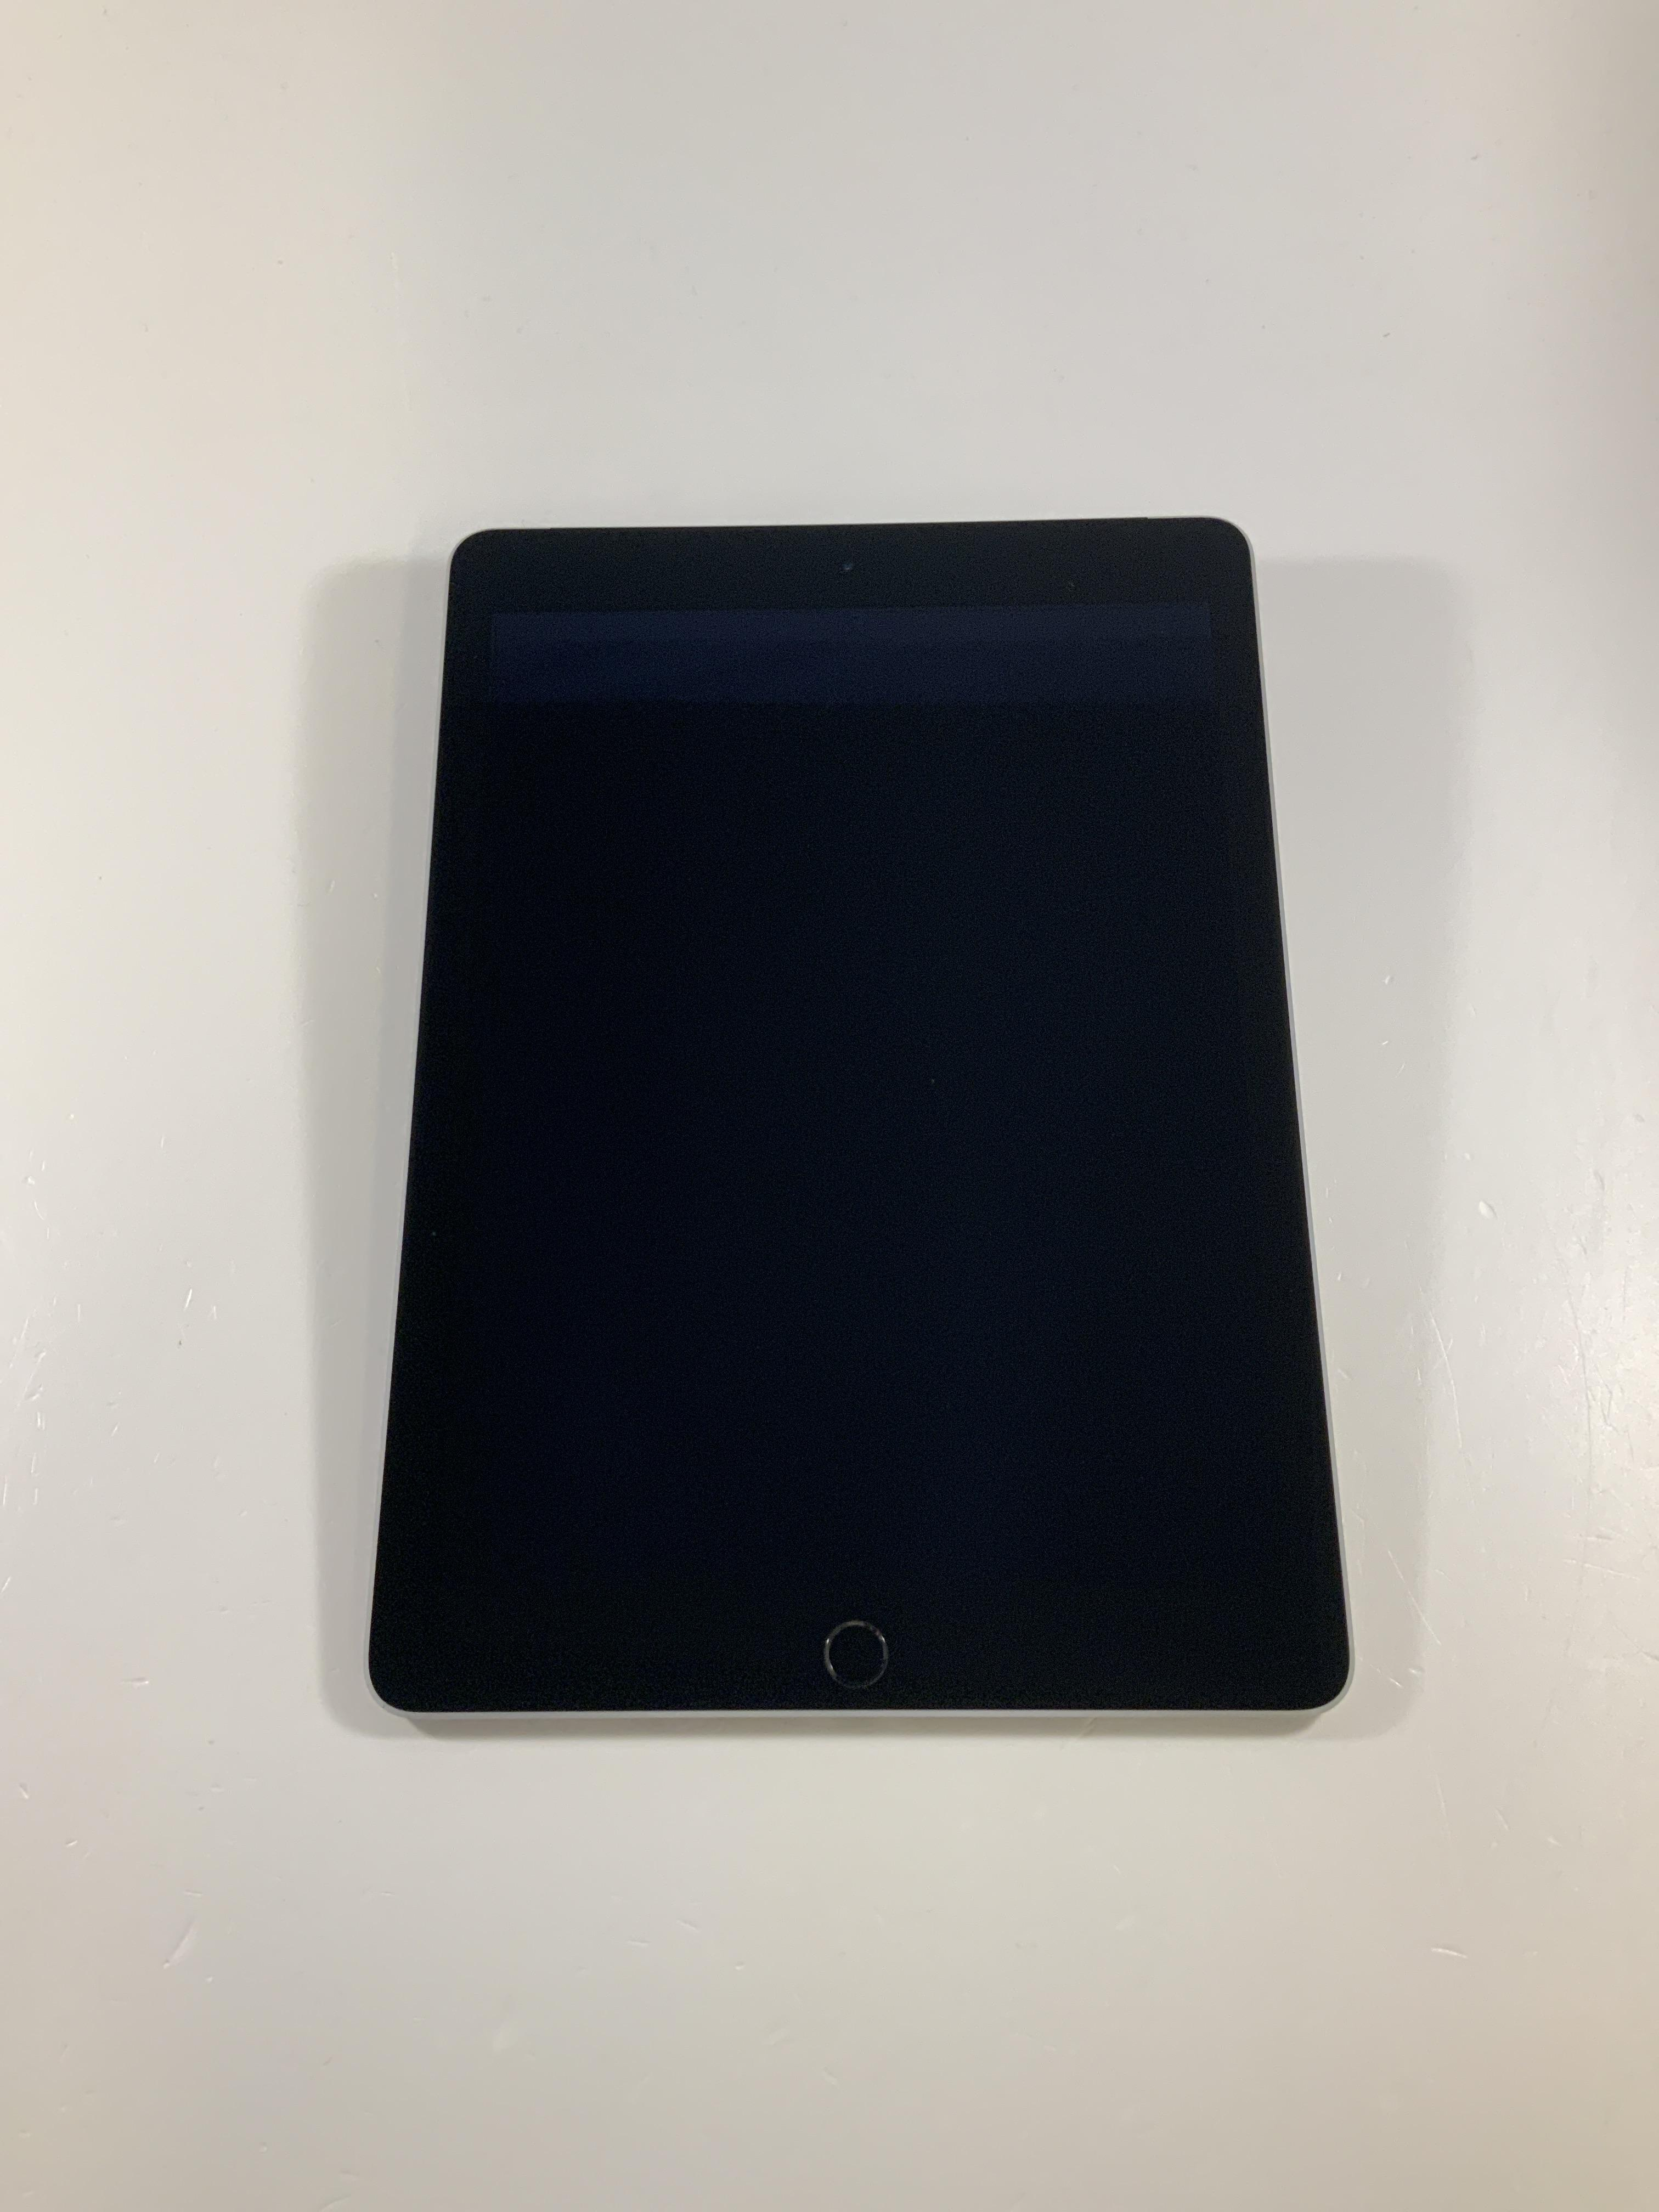 iPad Air 2 Wi-Fi + Cellular 32GB, 32GB, Space Gray, immagine 1